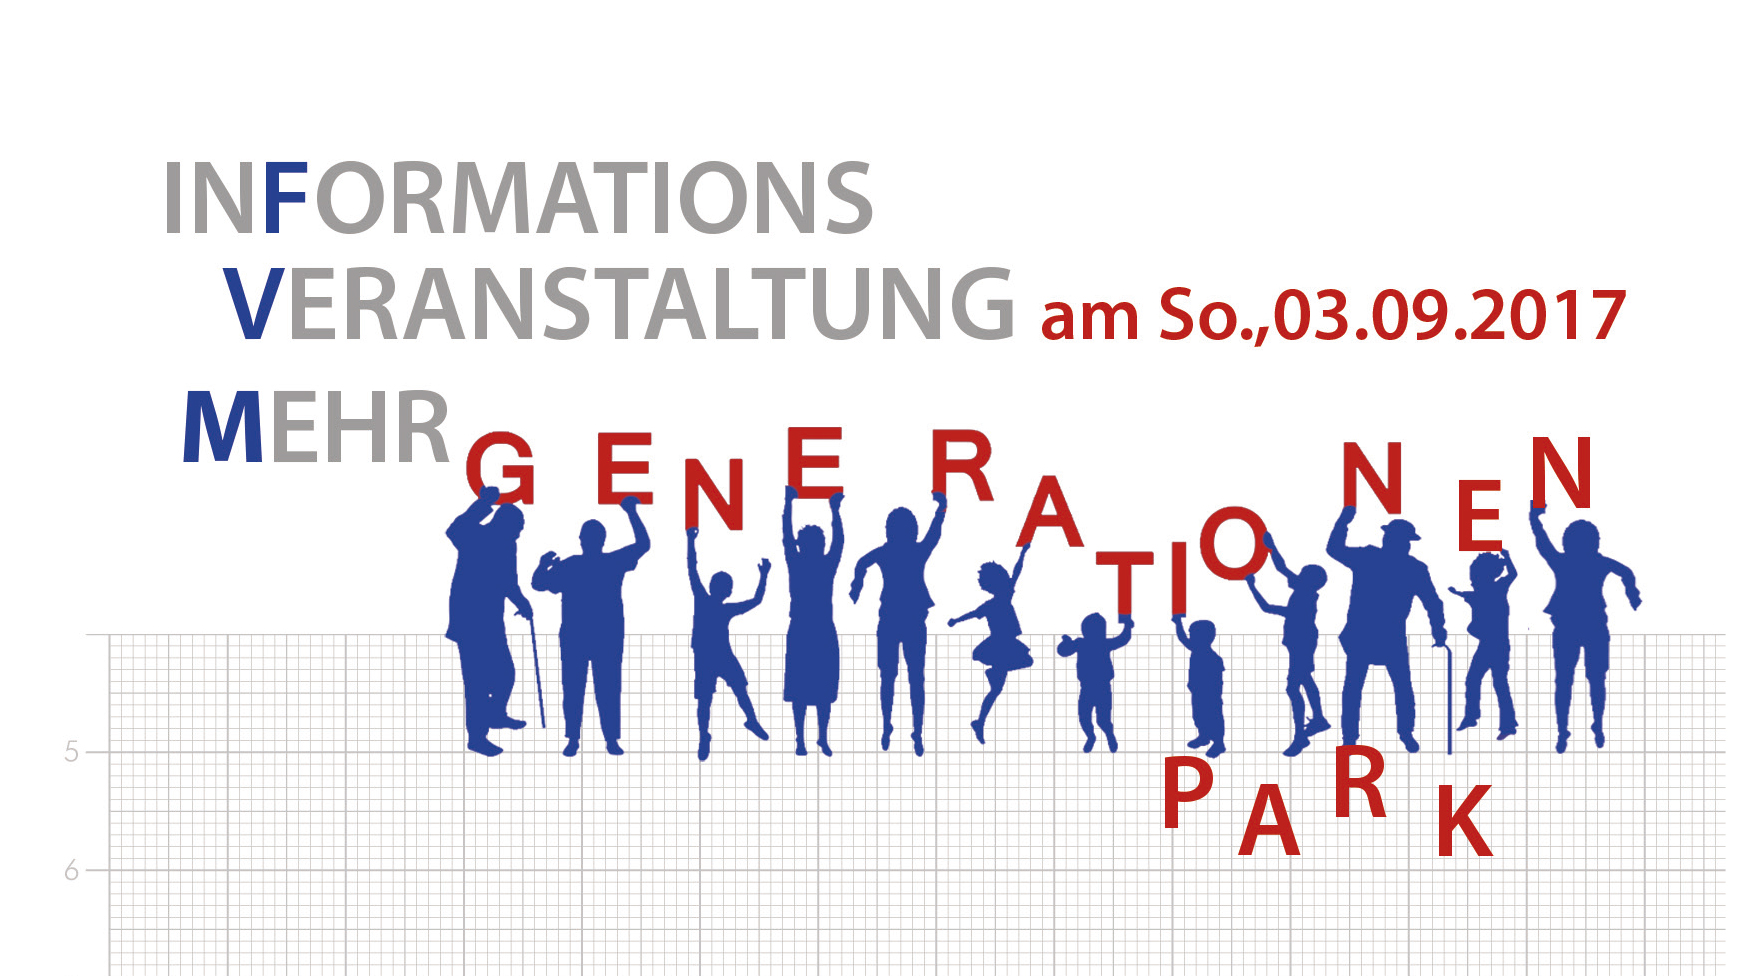 Informationsveranstaltung, Sonntag, 03.09.2017